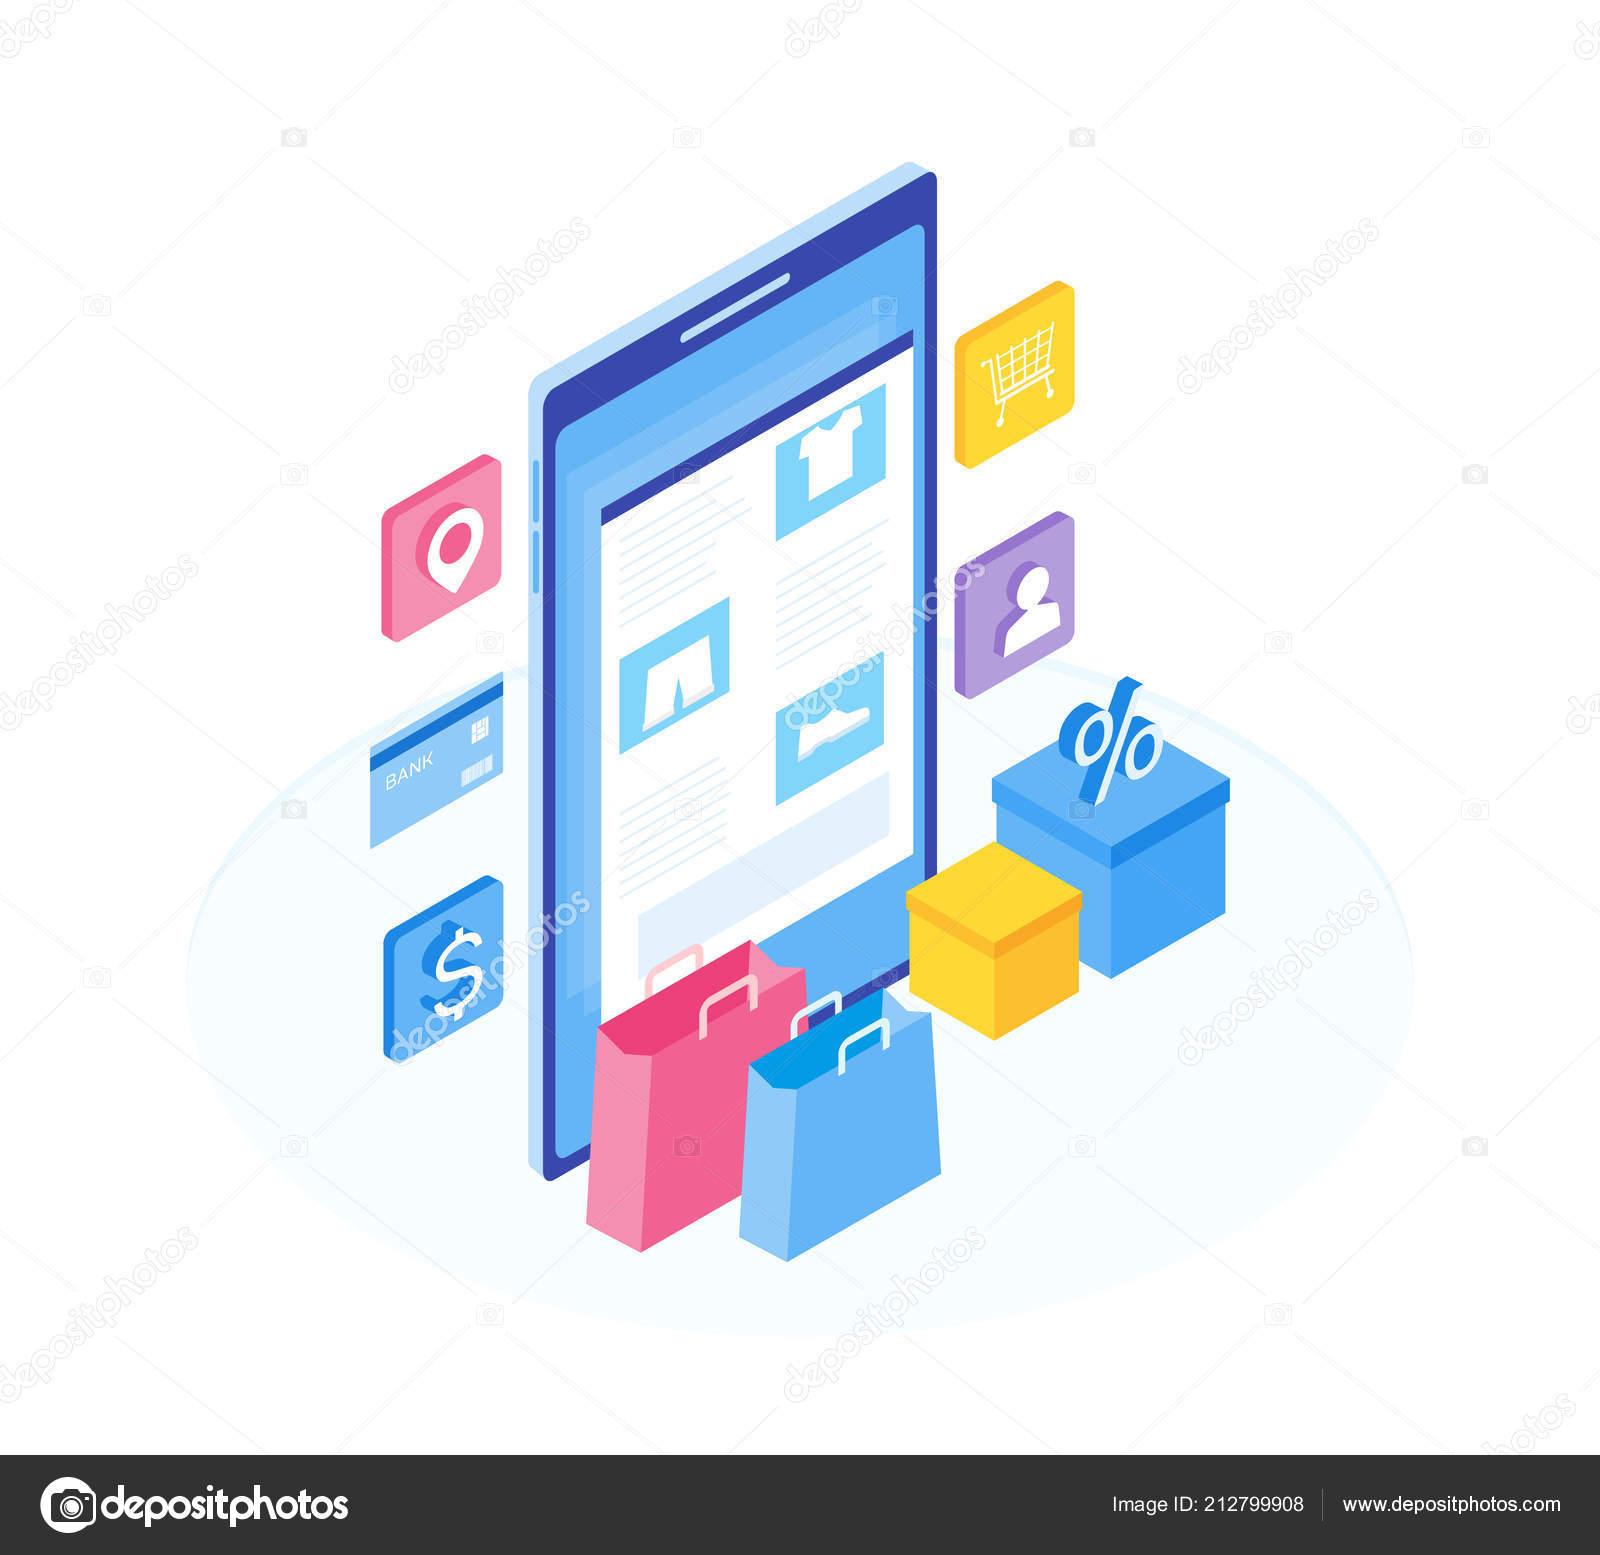 13df302e0d78 Το πρόγραμμα εγκατάστασης λειτουργίες online κατάστημα. Ισομετρική εικόνα  του smartphone